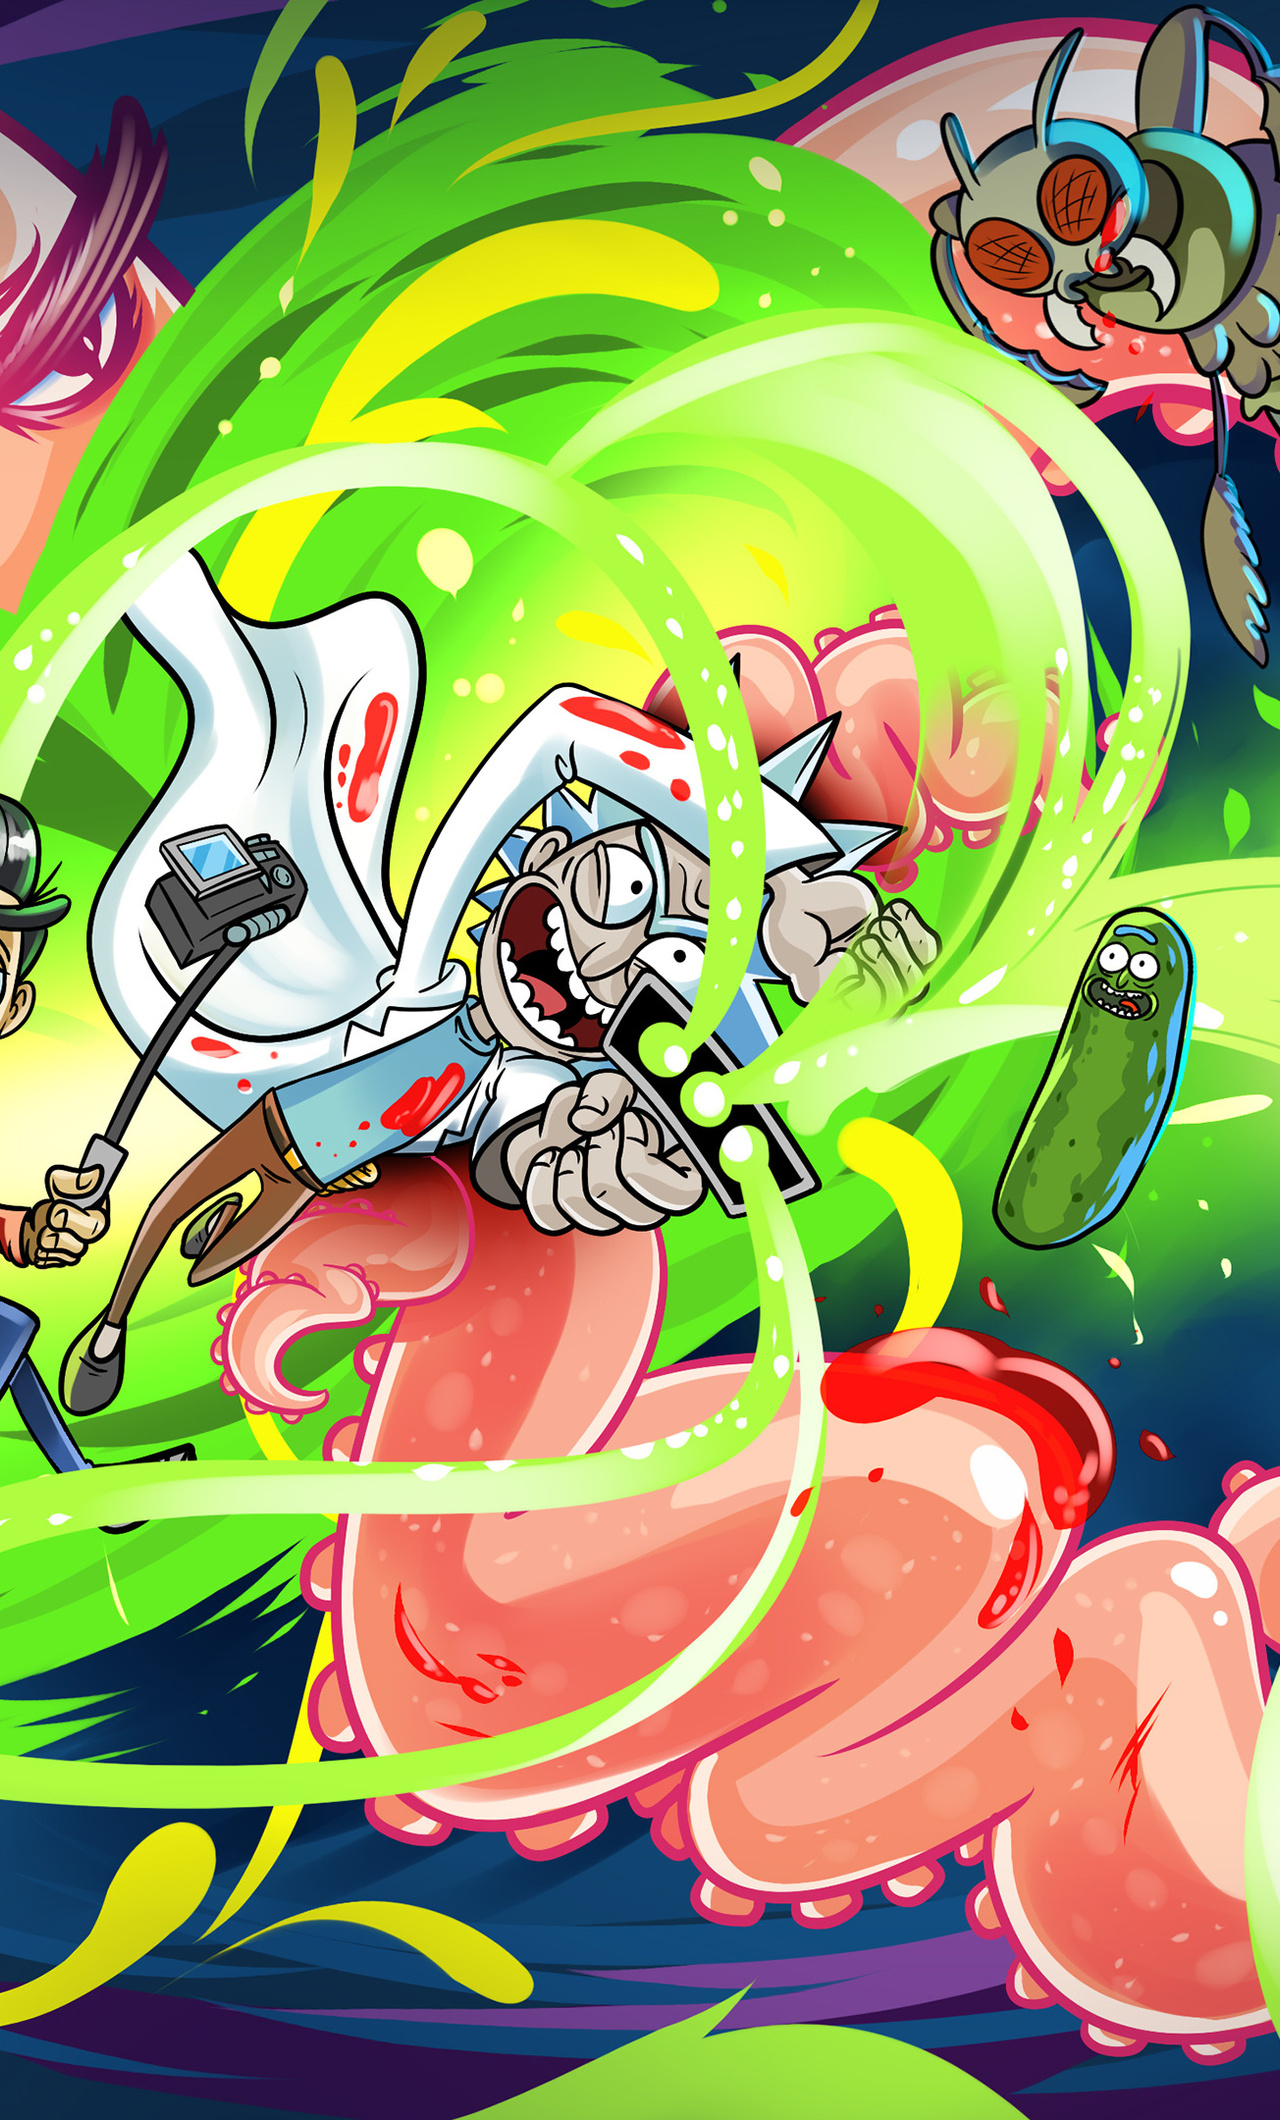 1280x2120 Rick And Morty Artwork 4k iPhone 6+ HD 4k ...